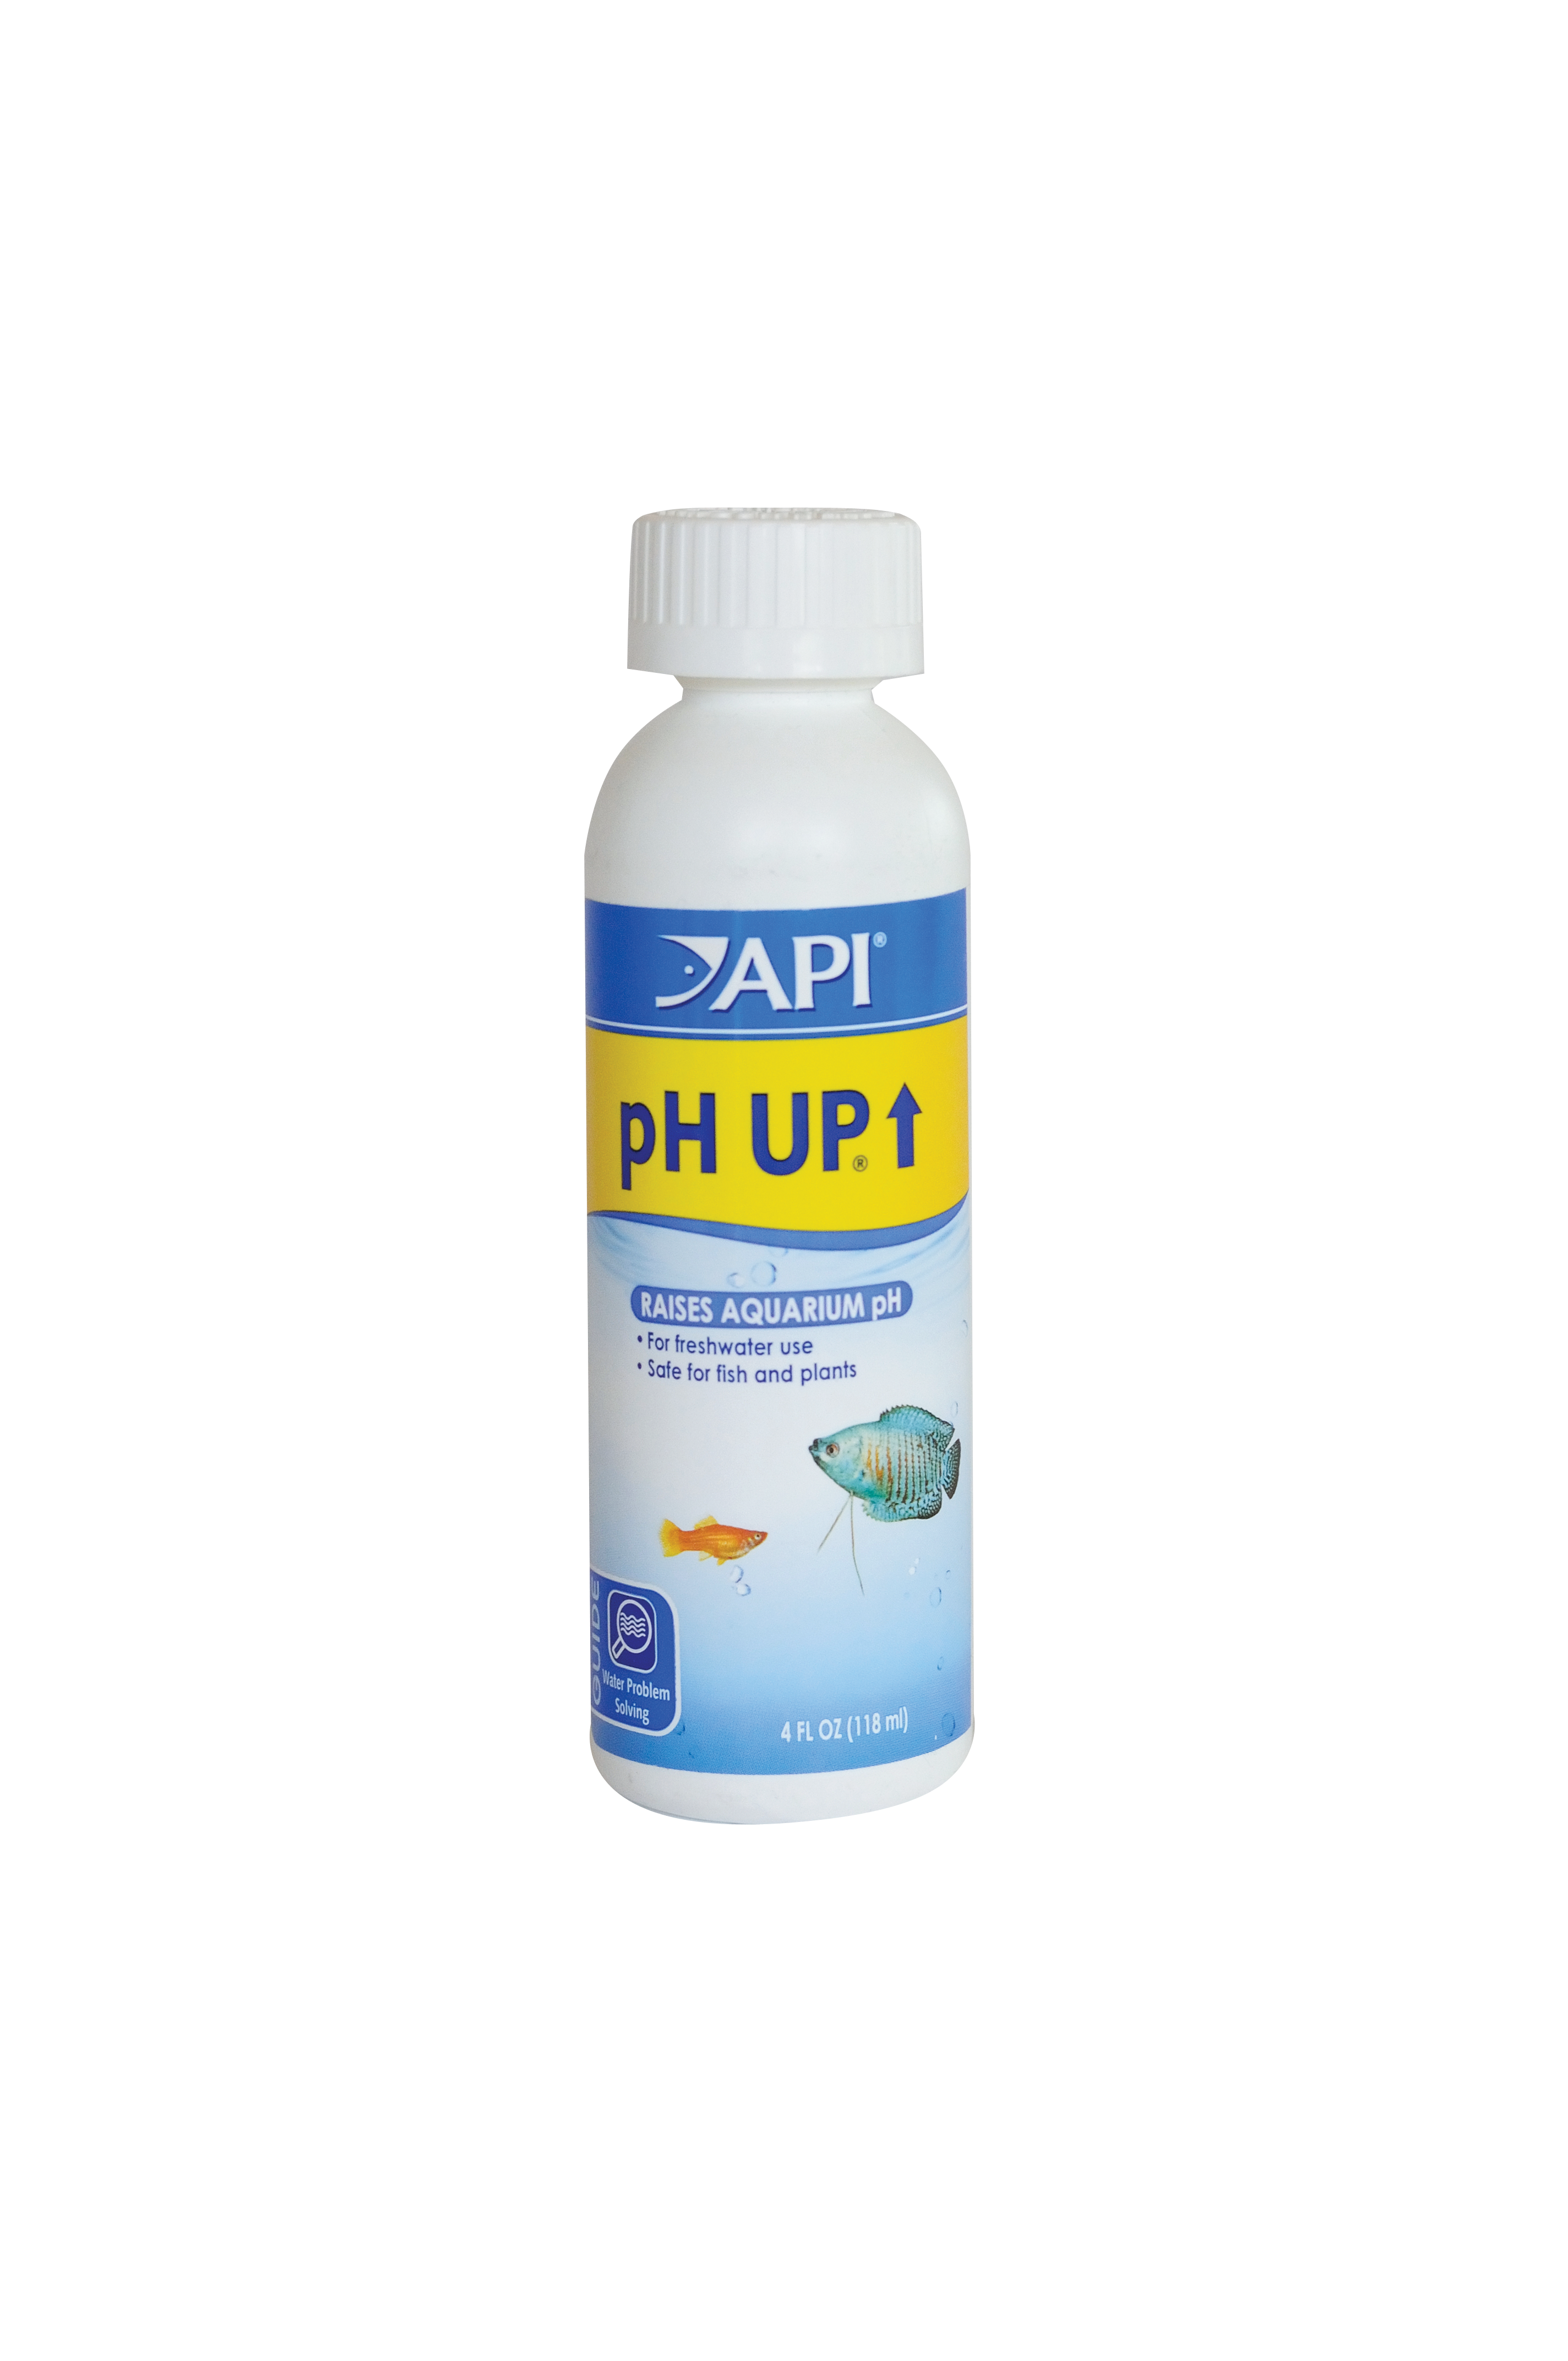 pH UP™